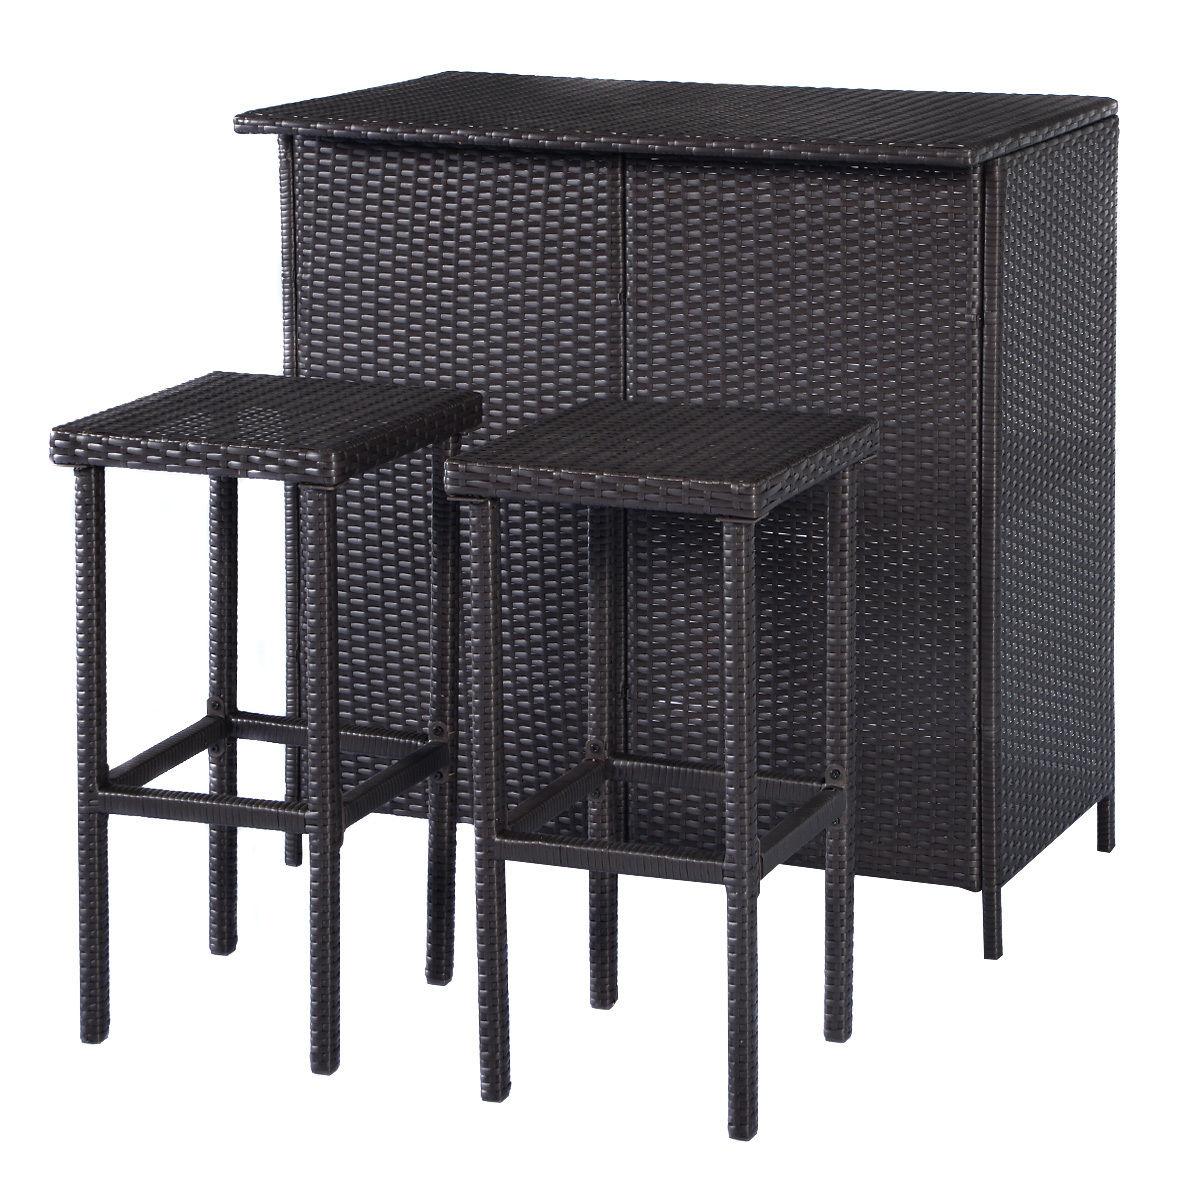 Costway 3PCS Rattan Wicker Bar Set Patio Outdoor Table & 2 Stools Furniture Brown 6